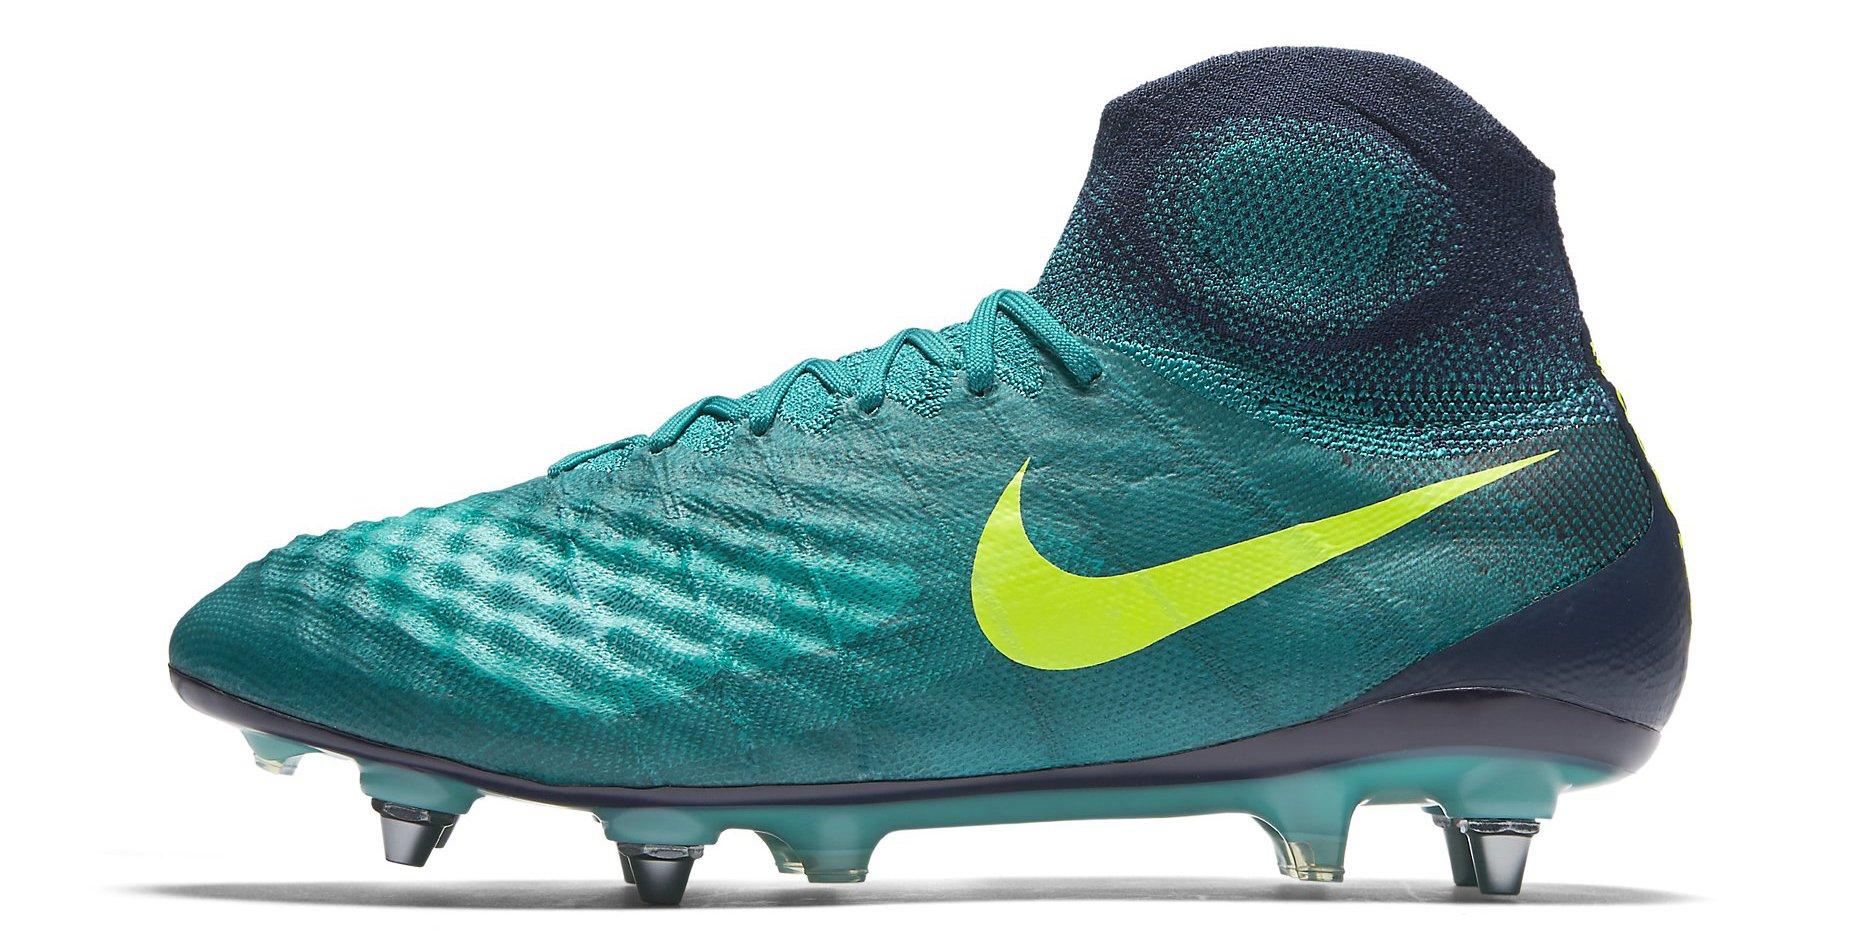 Kopačky Nike Magista Obra II SG-PRO